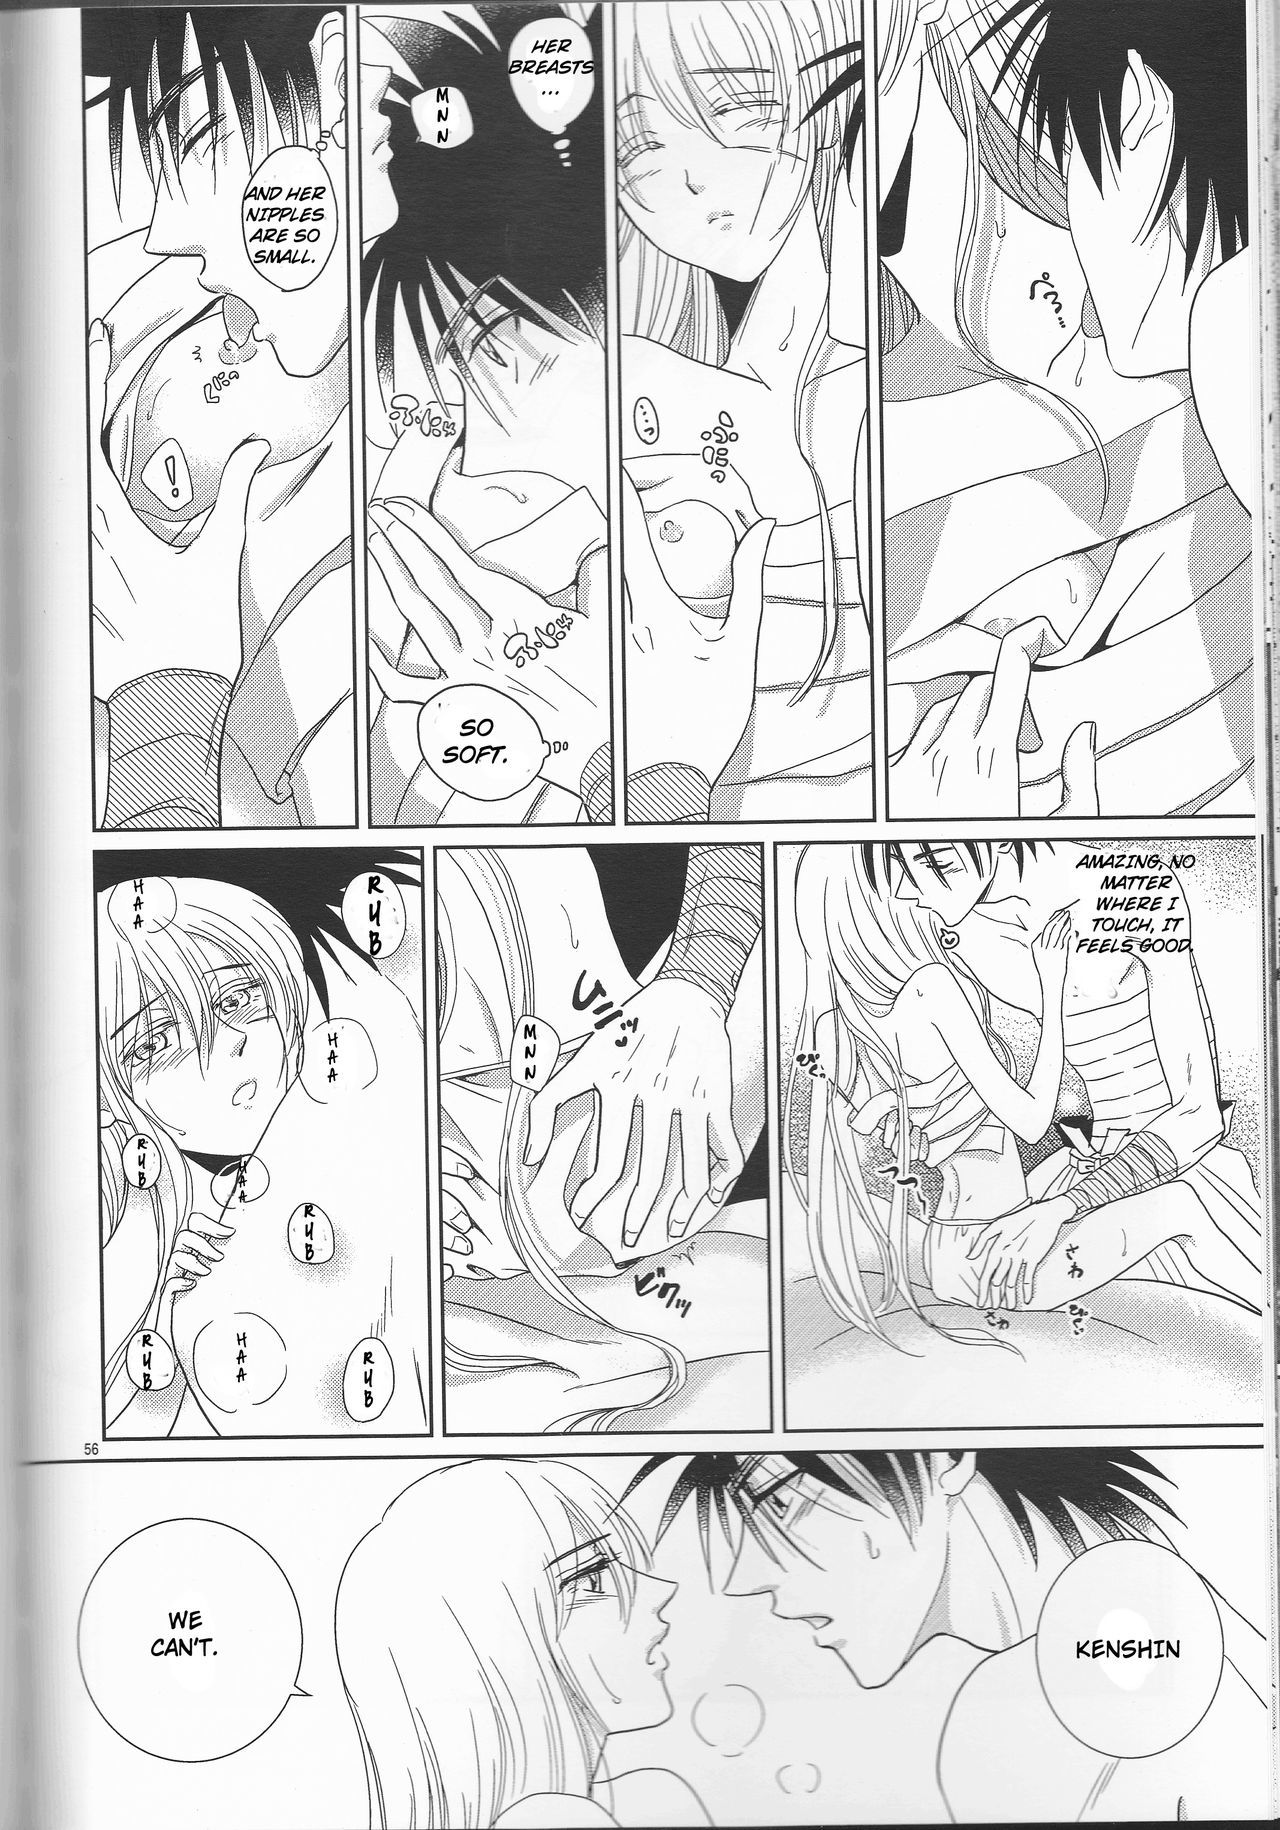 Hime ken ryoran page 56